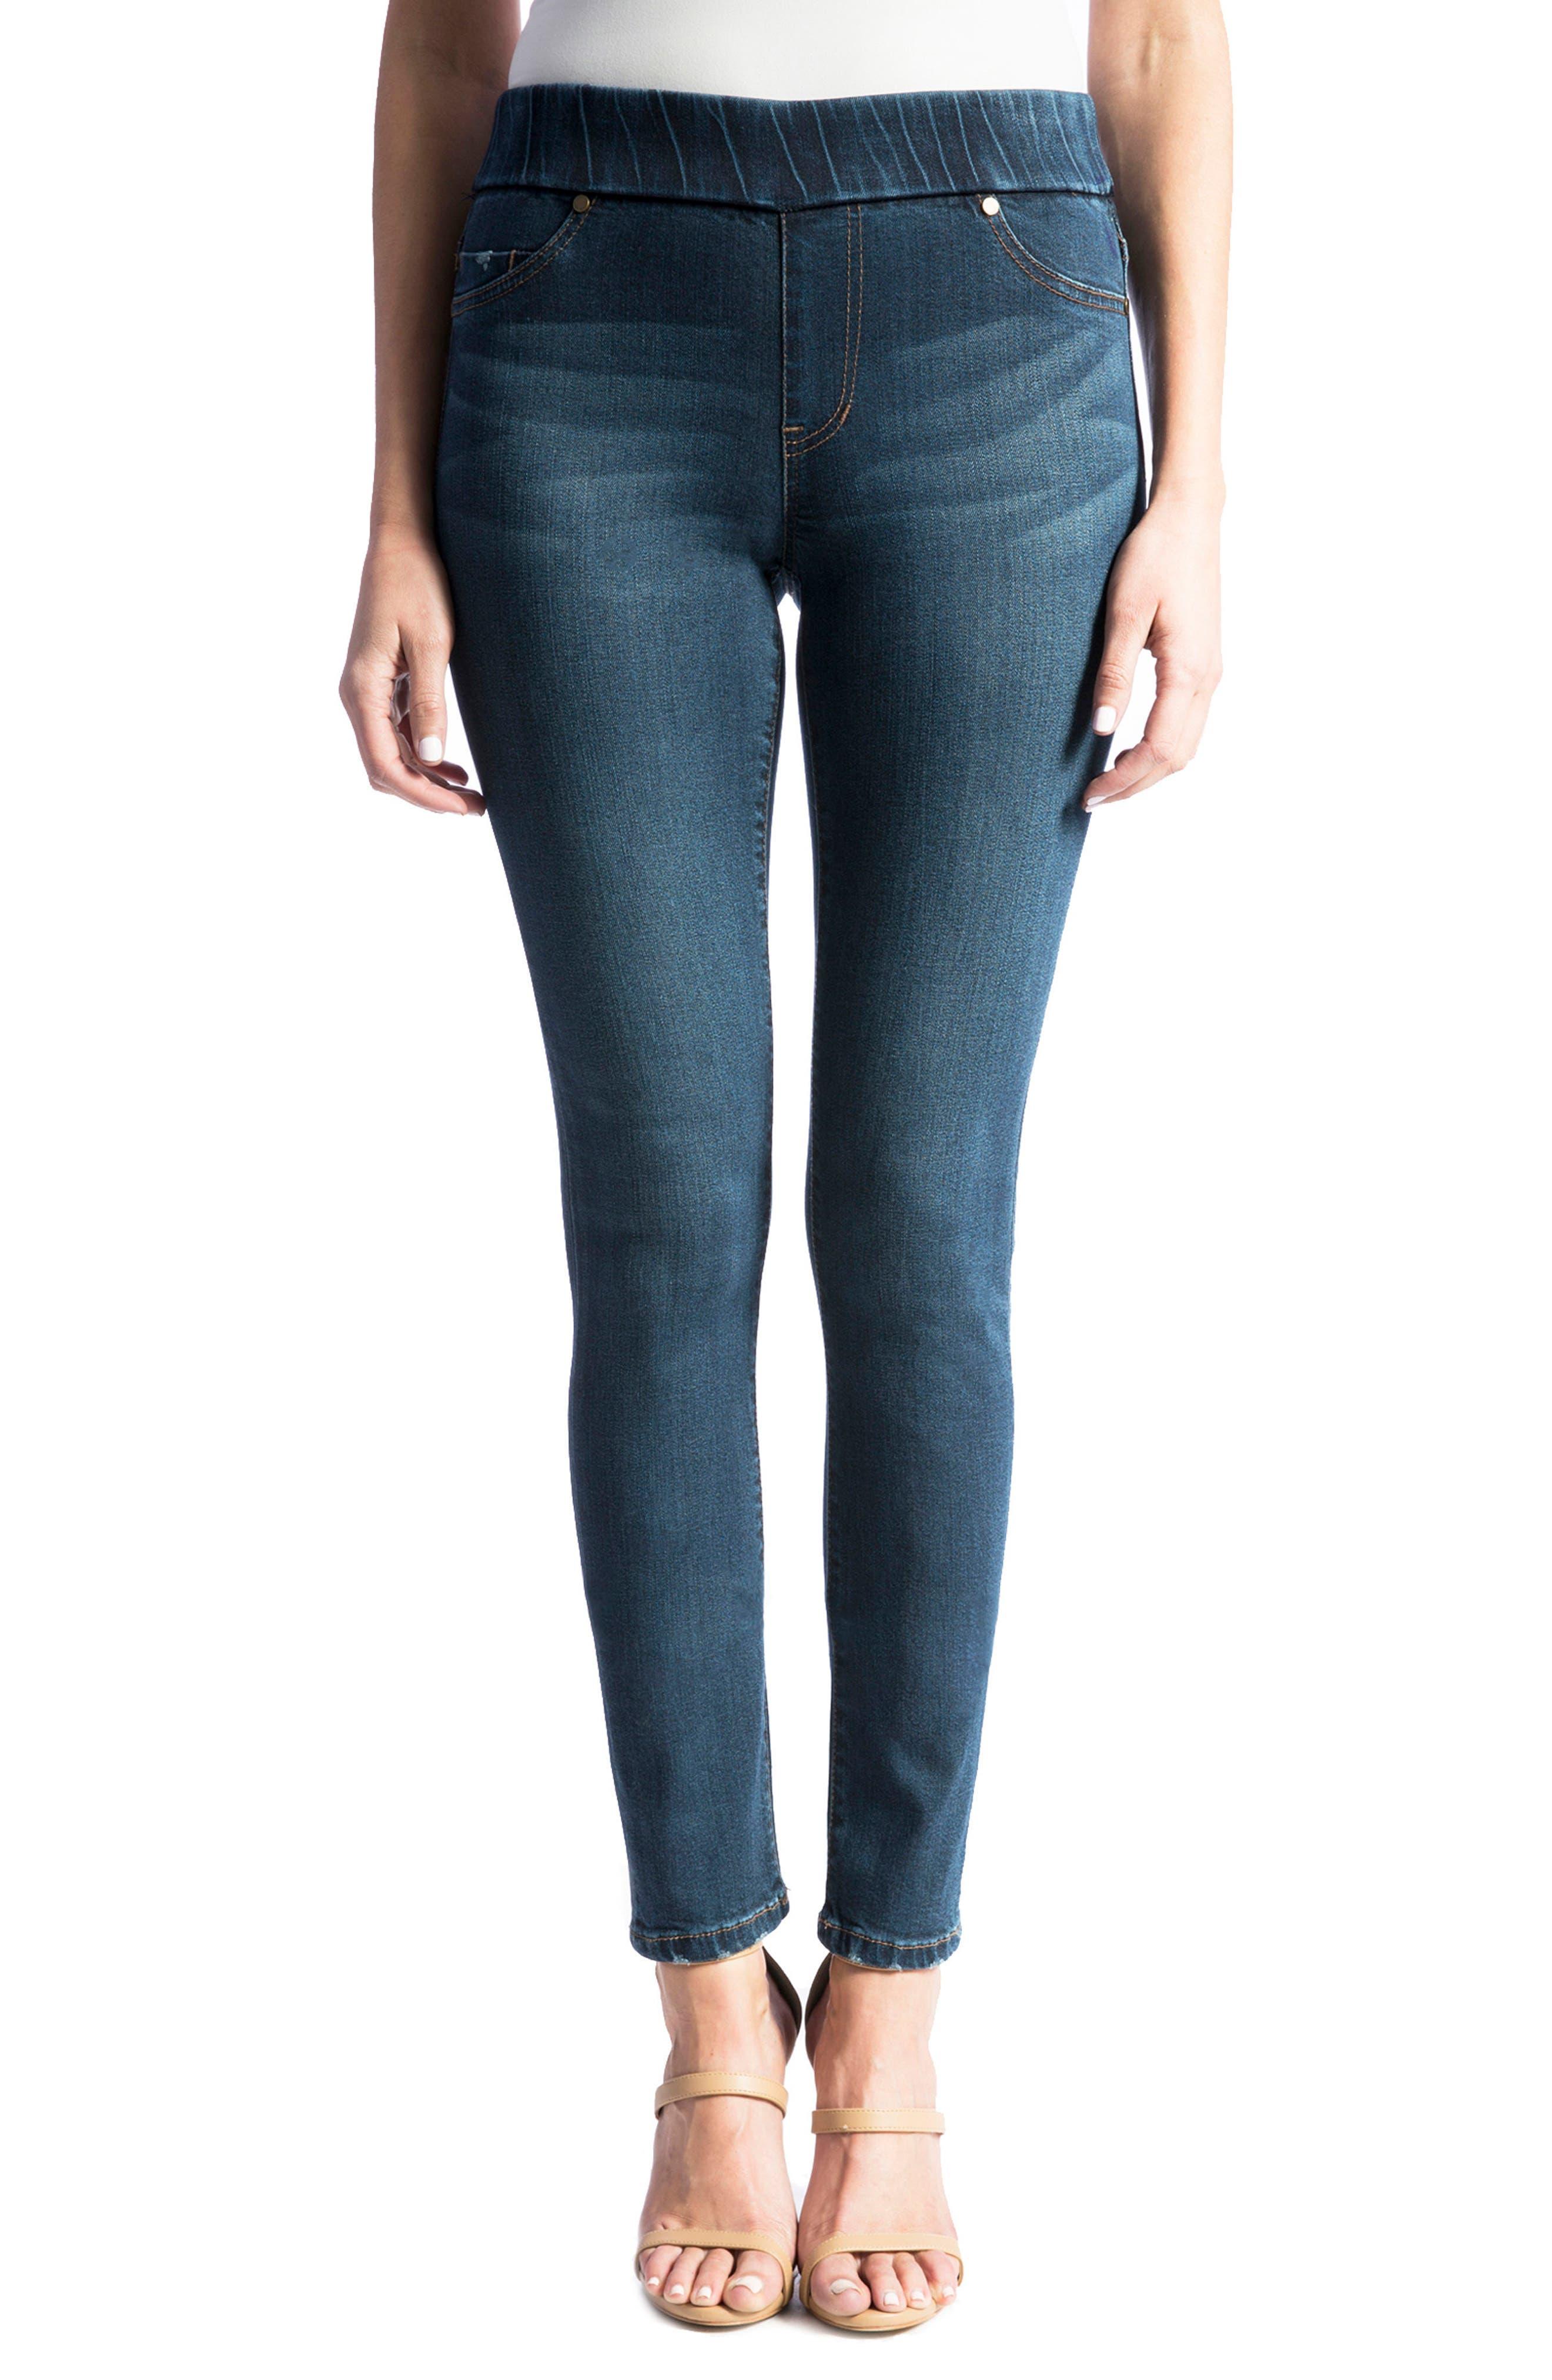 Liverpool Jeans Company Sienna Mid Rise Soft Stretch Denim Leggings (Petrol)